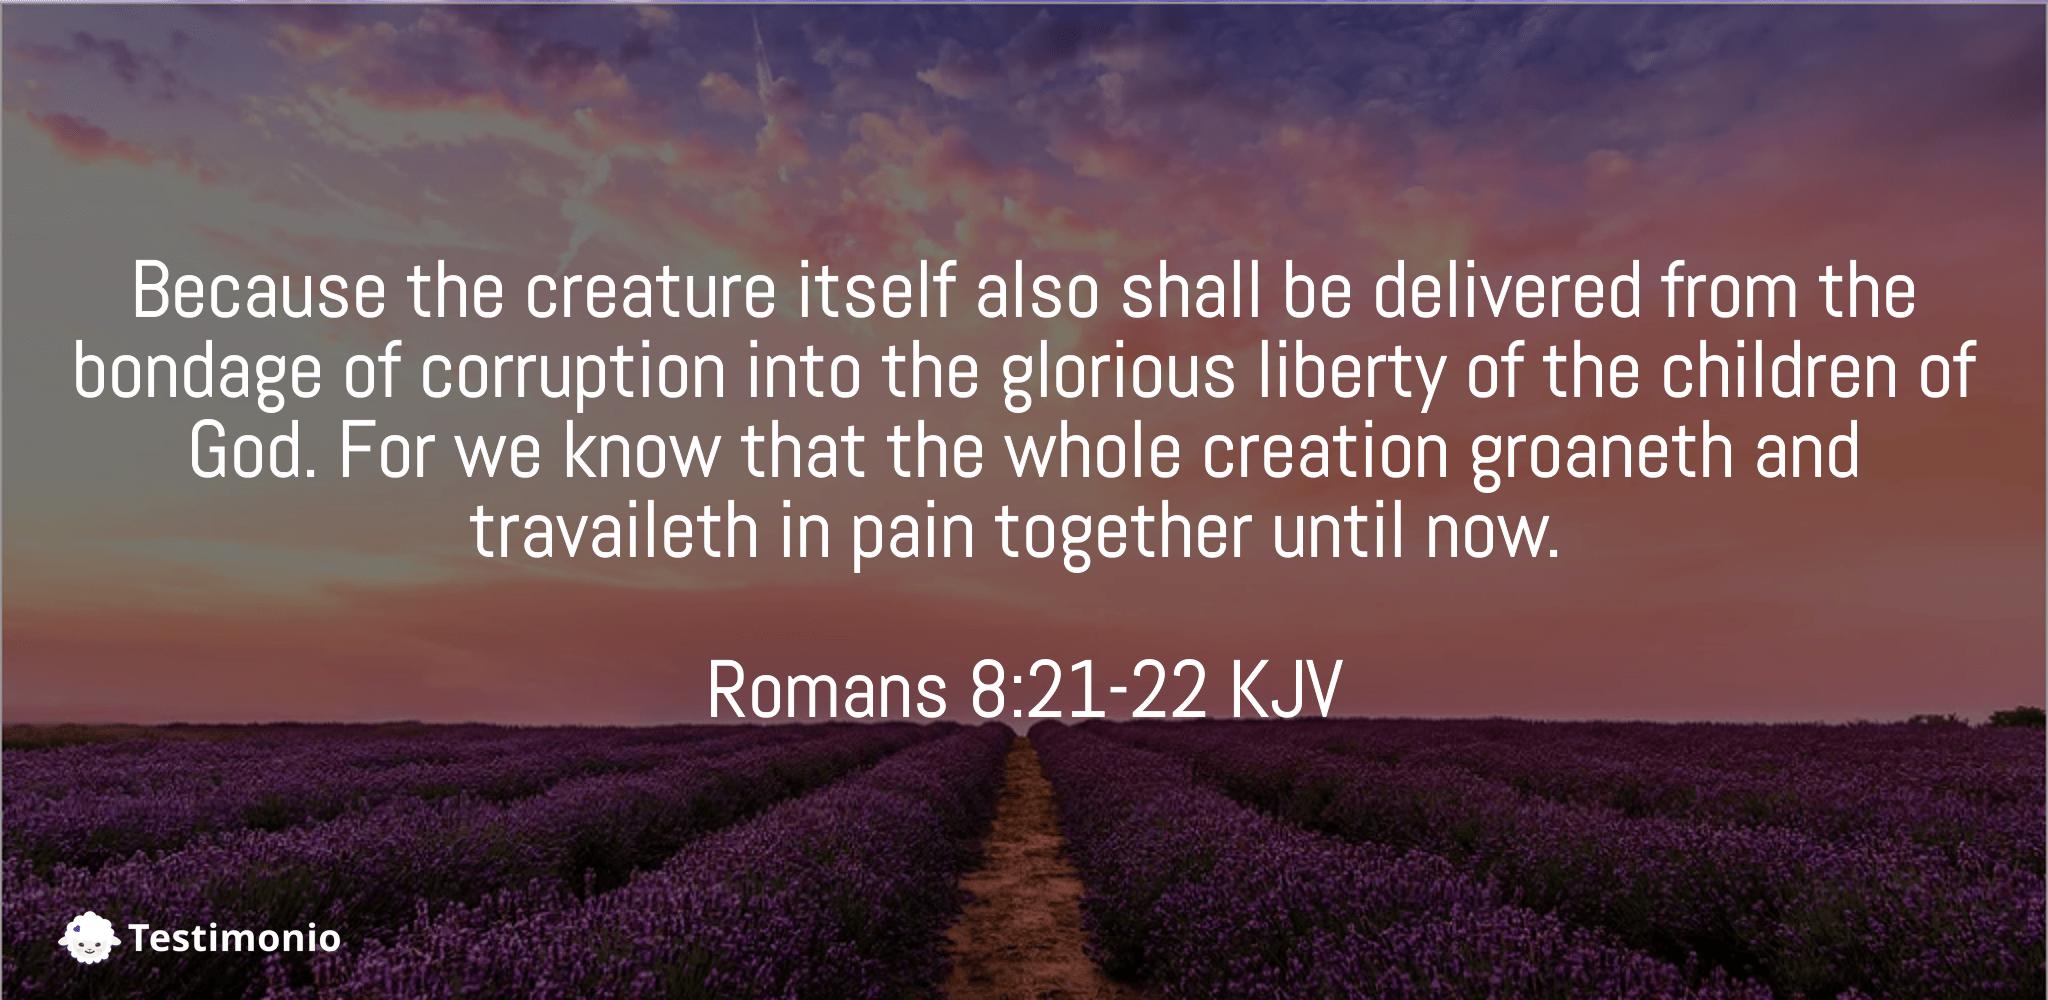 Romans 8:21-22